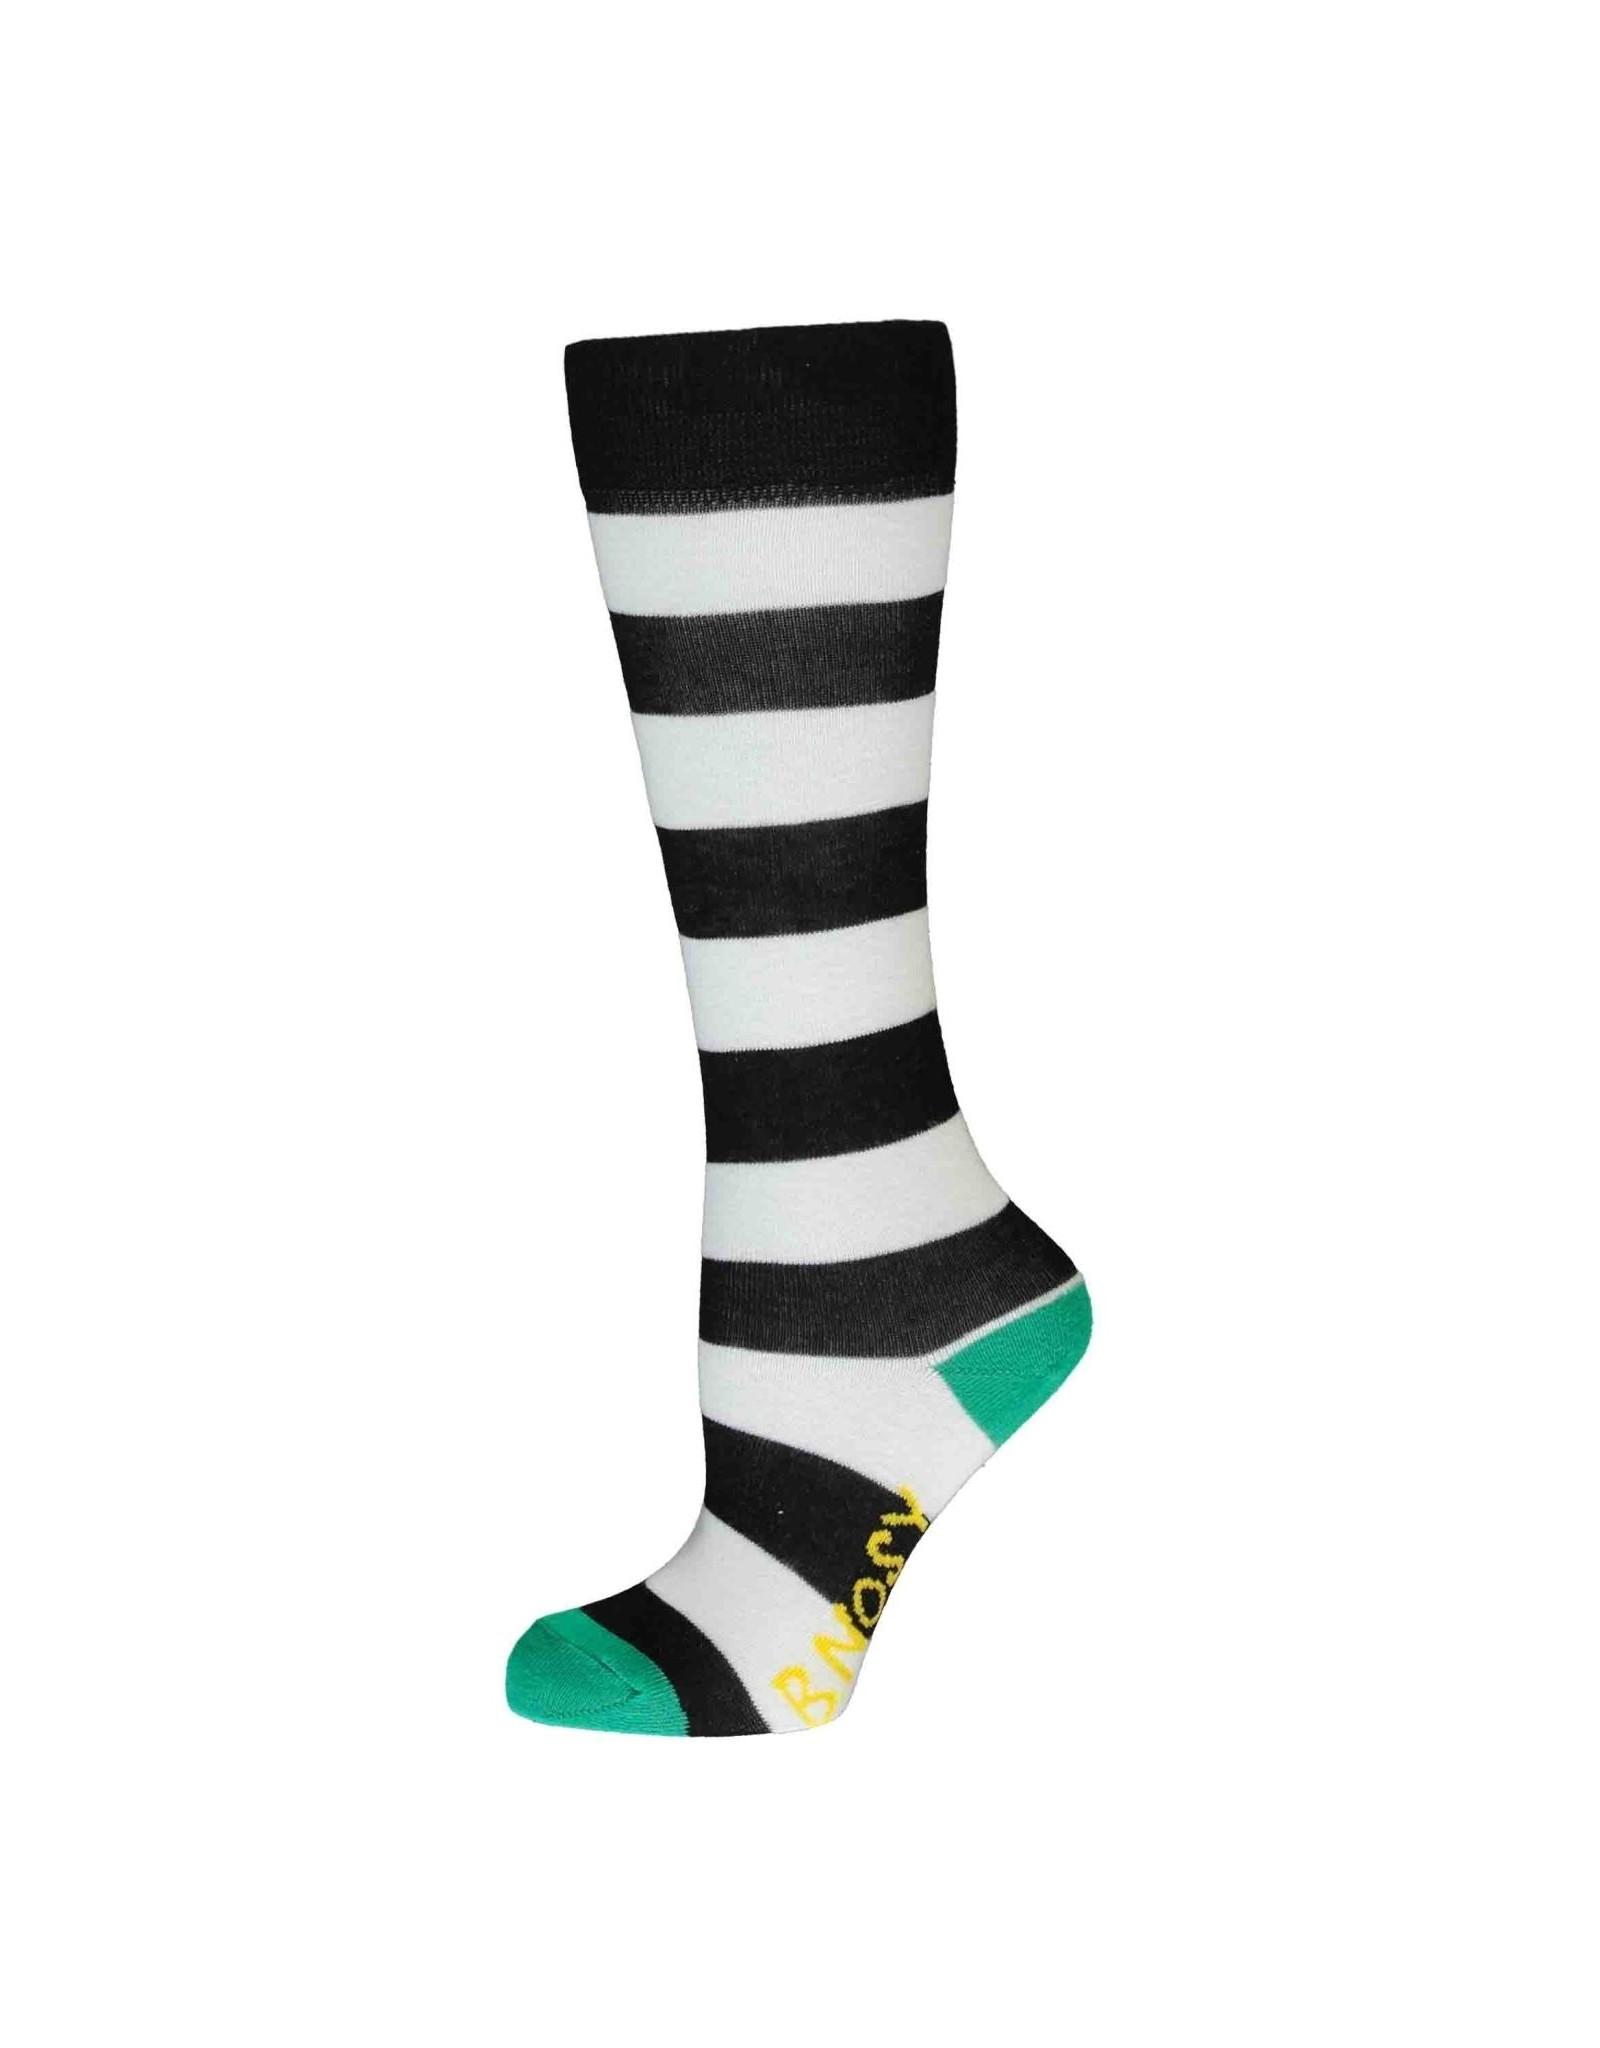 B.Nosy B.Nosy meisjes gestreepte sokken Cheer Black White Stripe